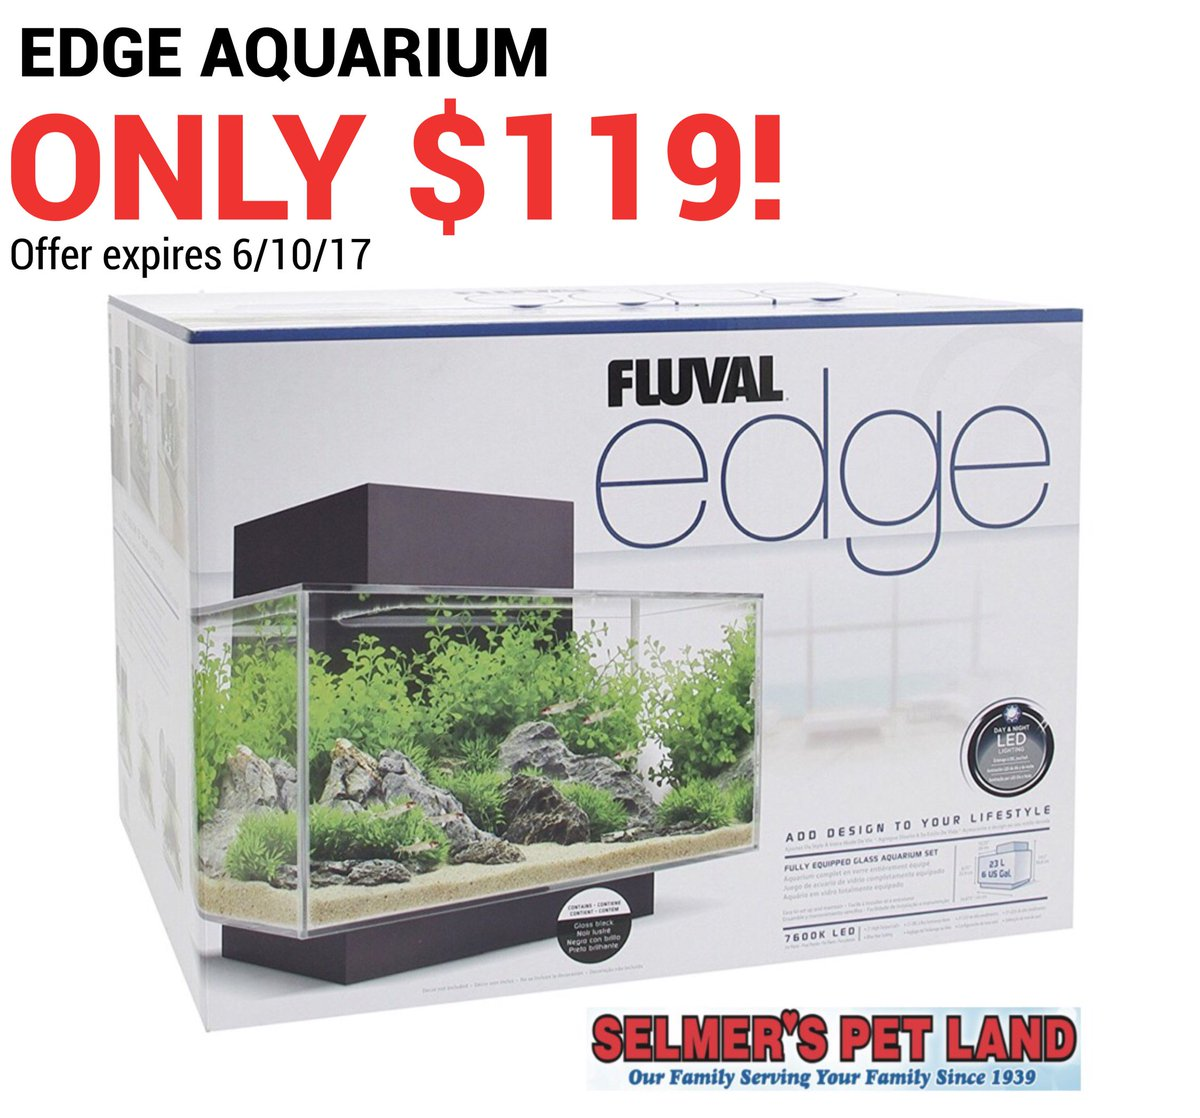 #EdgeAquarium just $119! #selmerspetland #selmers #huntington #huntingtonNY #pets #petshop #petstore #fluvaledgeaquarium #longisland<br>http://pic.twitter.com/LYjigWxV3k